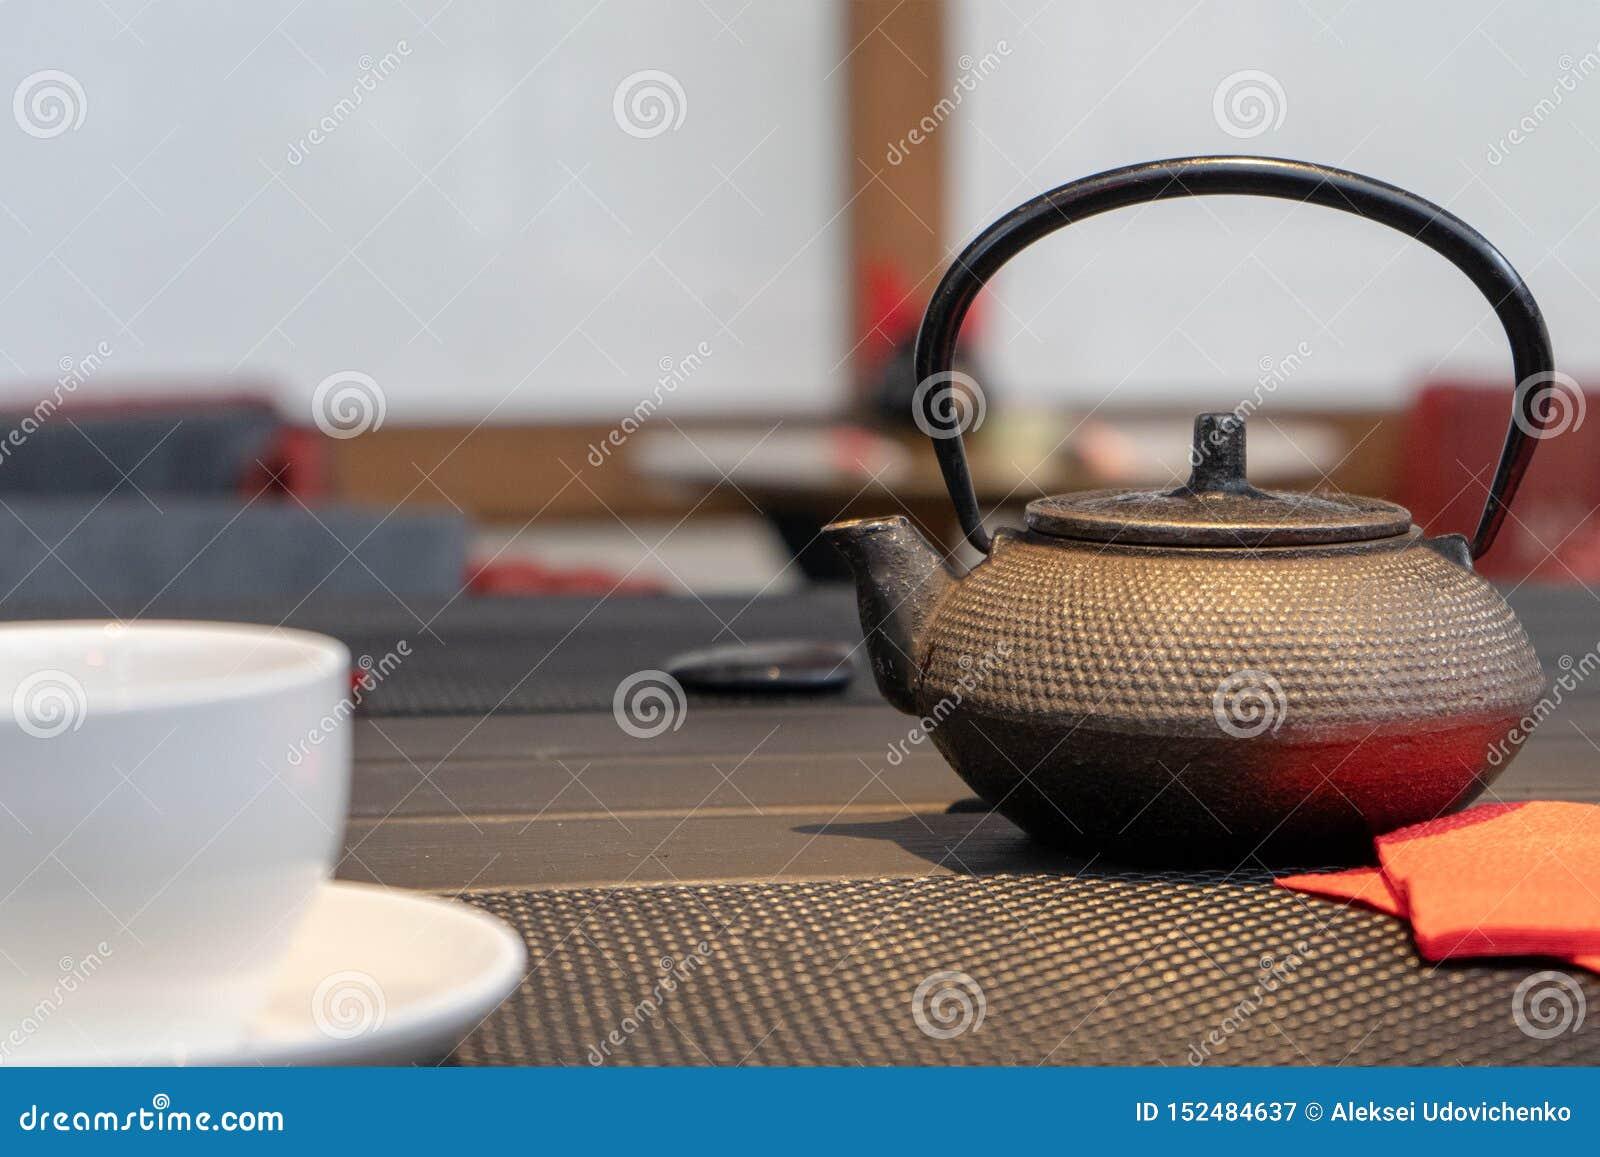 Photo of cast iron kettle under warm light